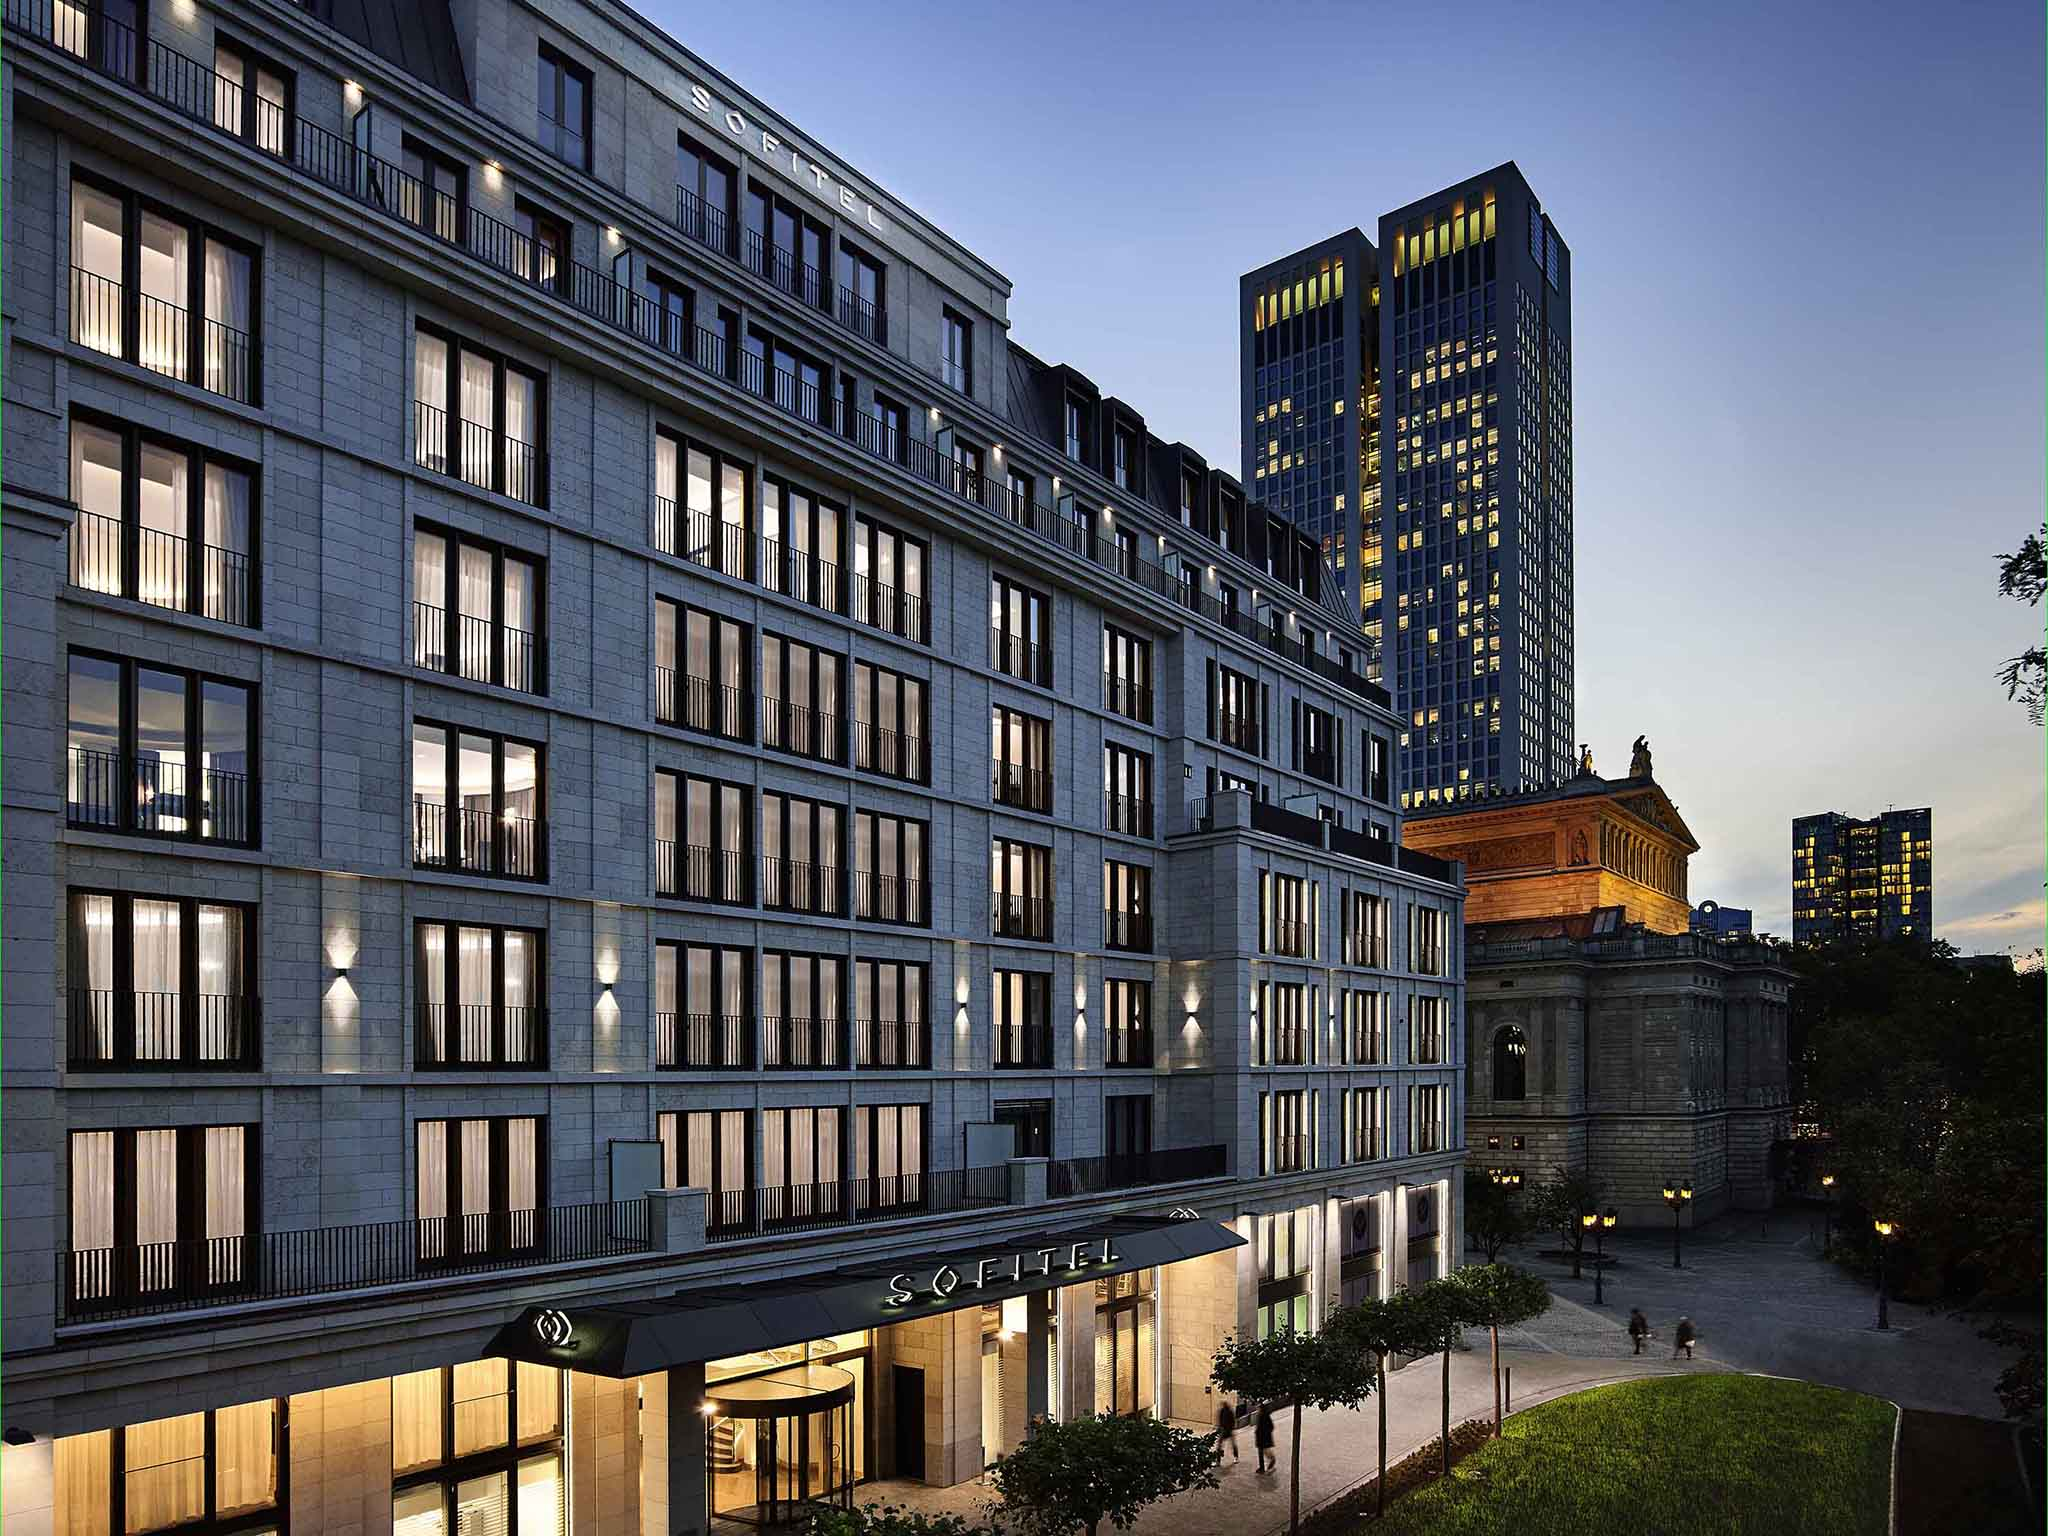 Hotel – Sofitel Frankfurt Opera